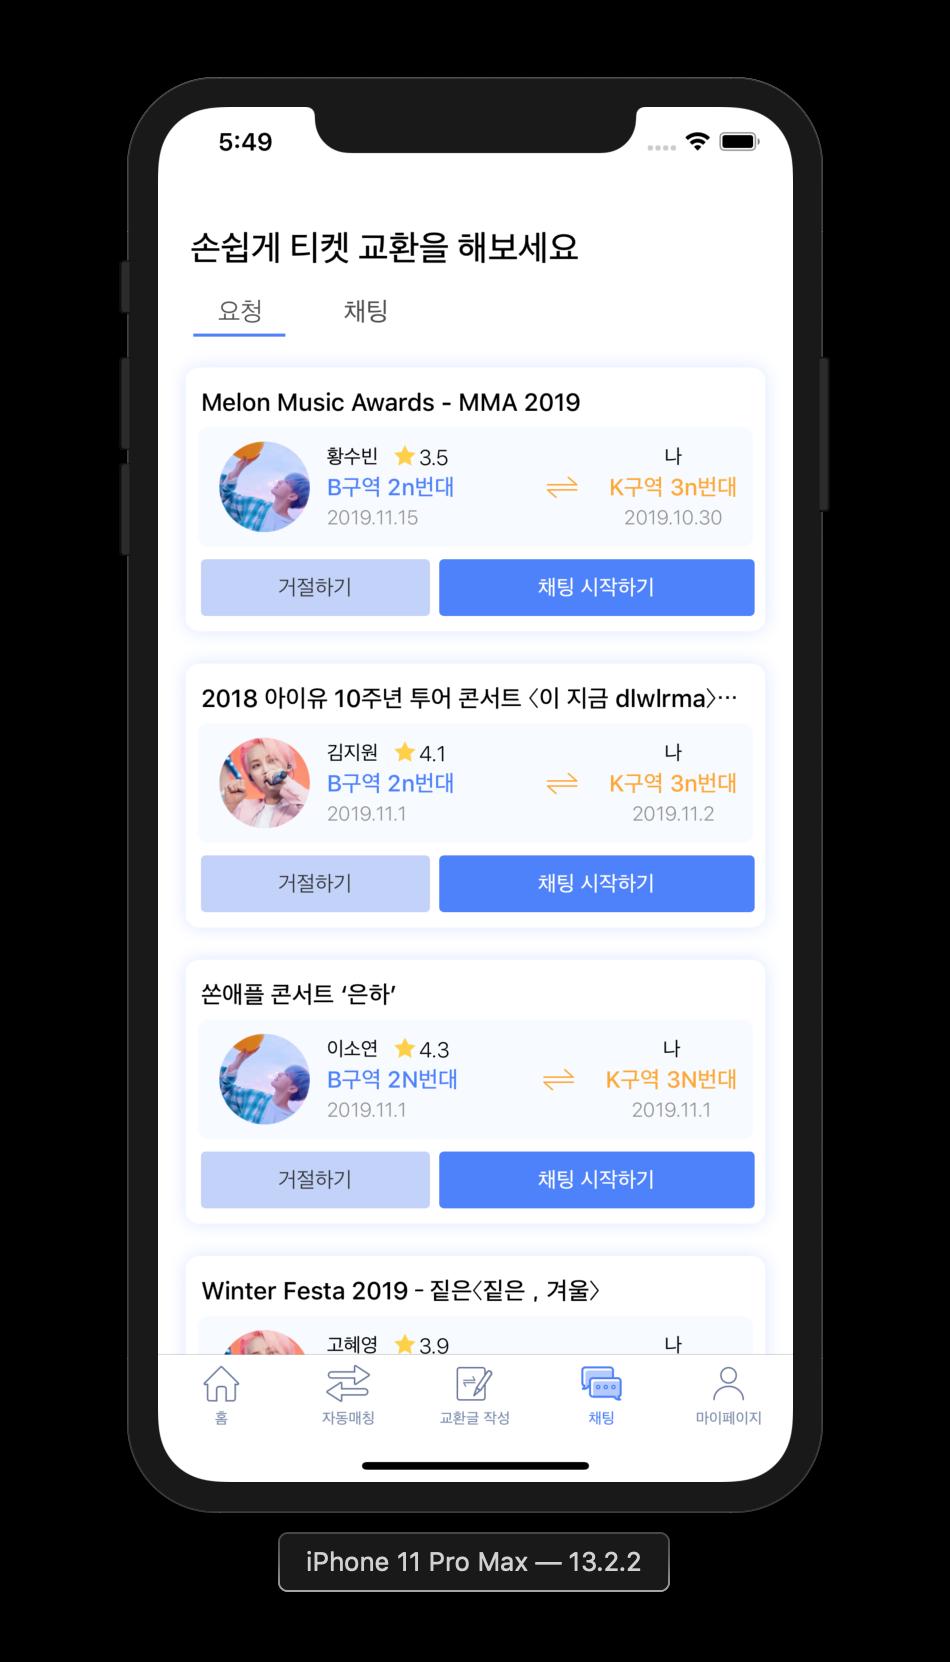 Melon Music Awards - MMA 2019